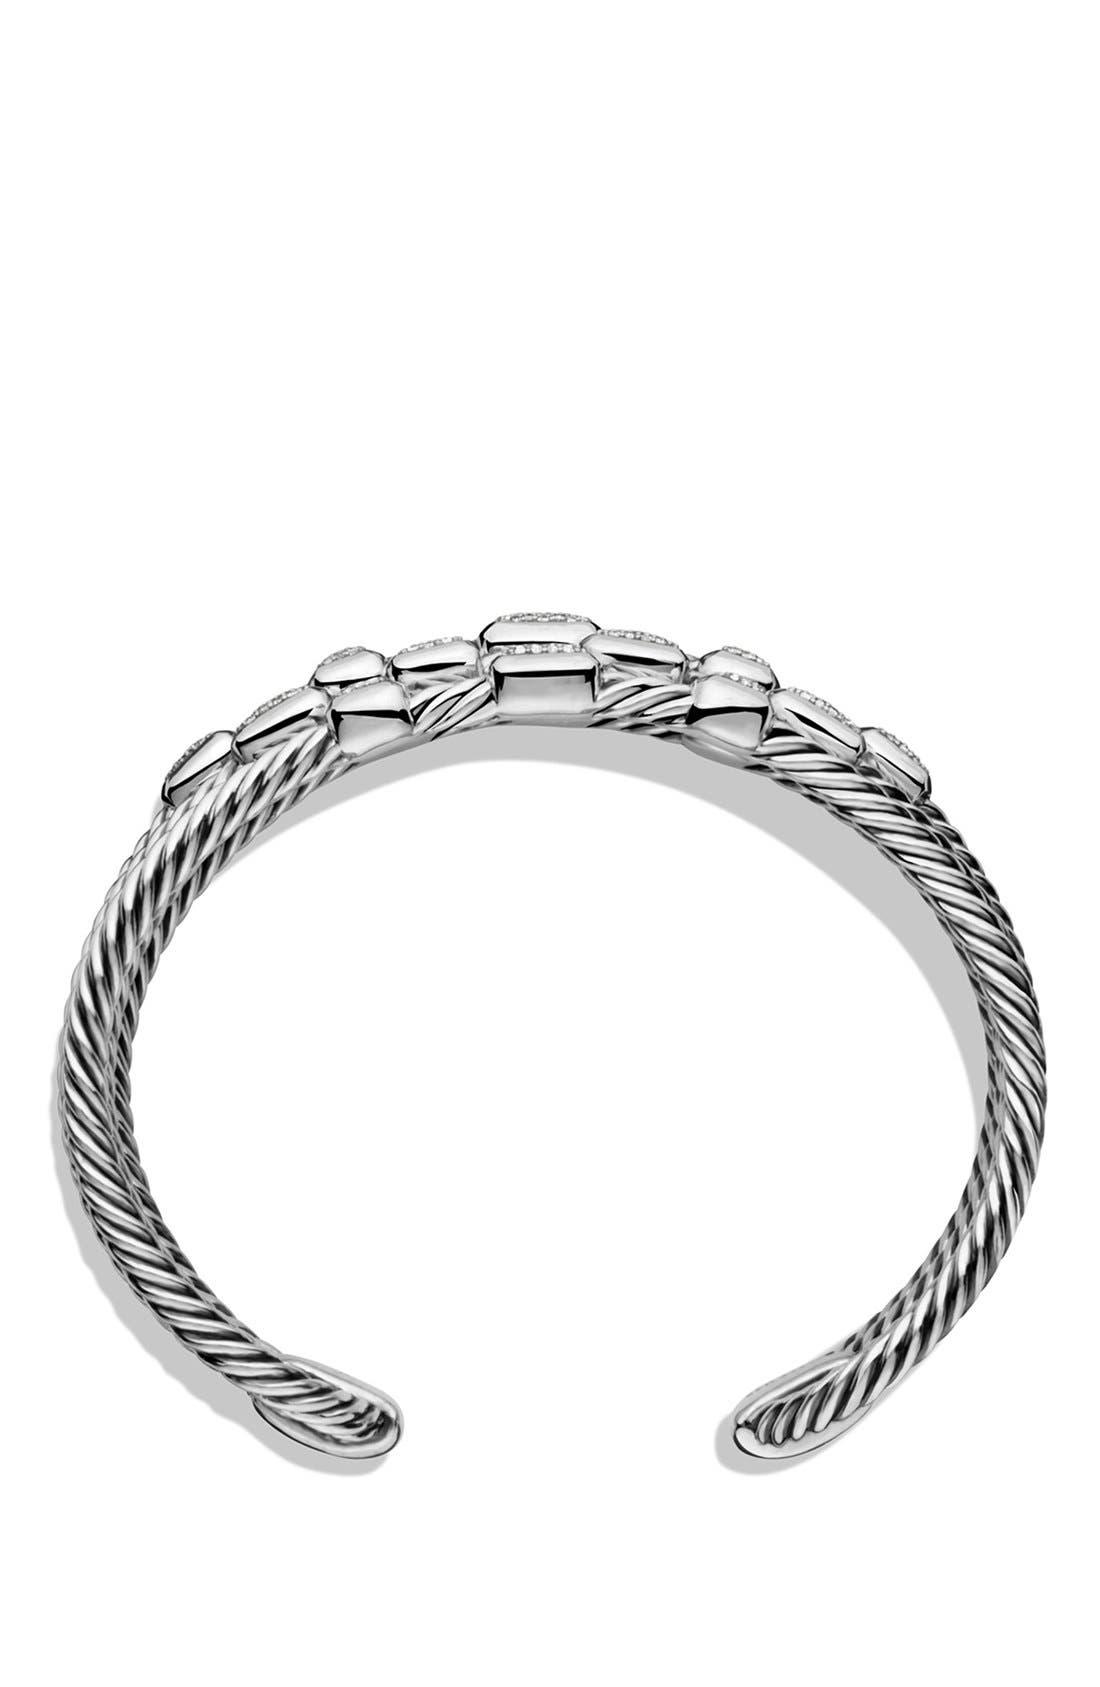 'Confetti' Wide Cuff Bracelet with Diamonds,                             Alternate thumbnail 2, color,                             040